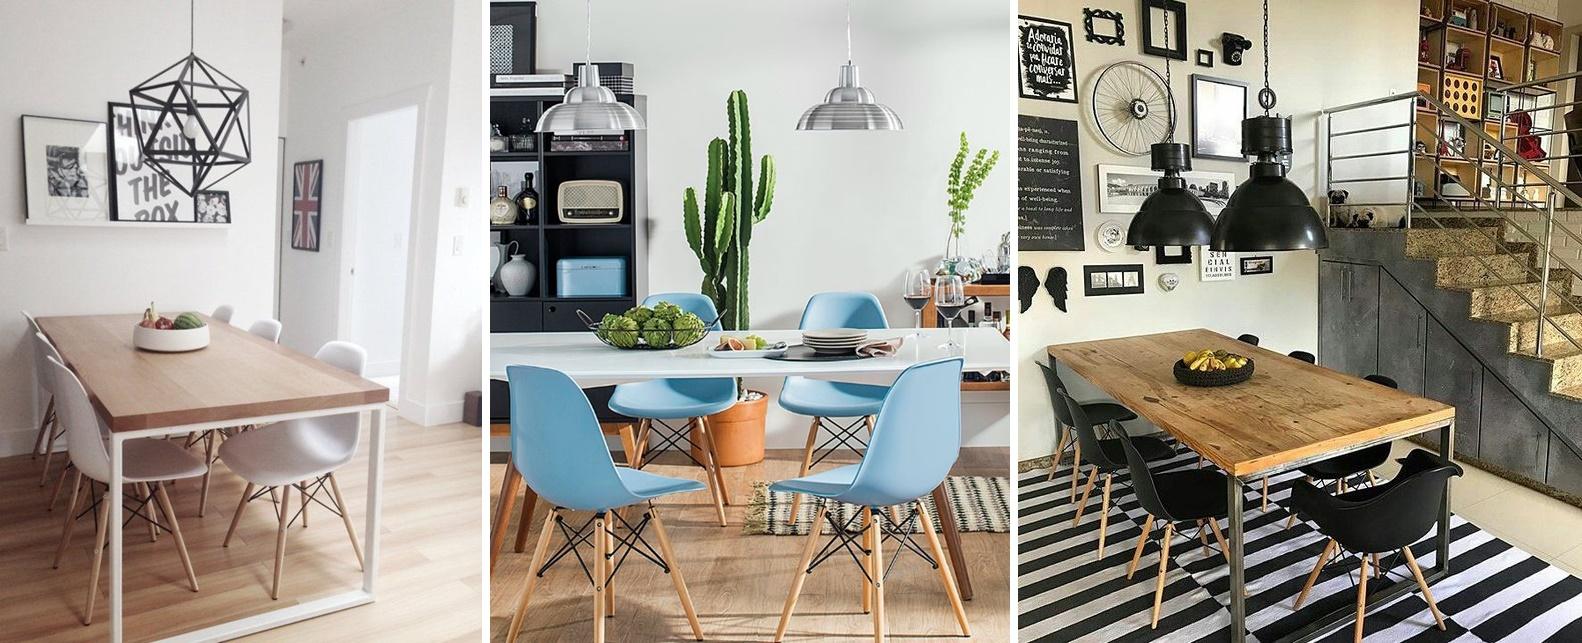 Inspira O Sala De Jantar Debora Montes Blog -> Sala De Jantar Estilo Alemao